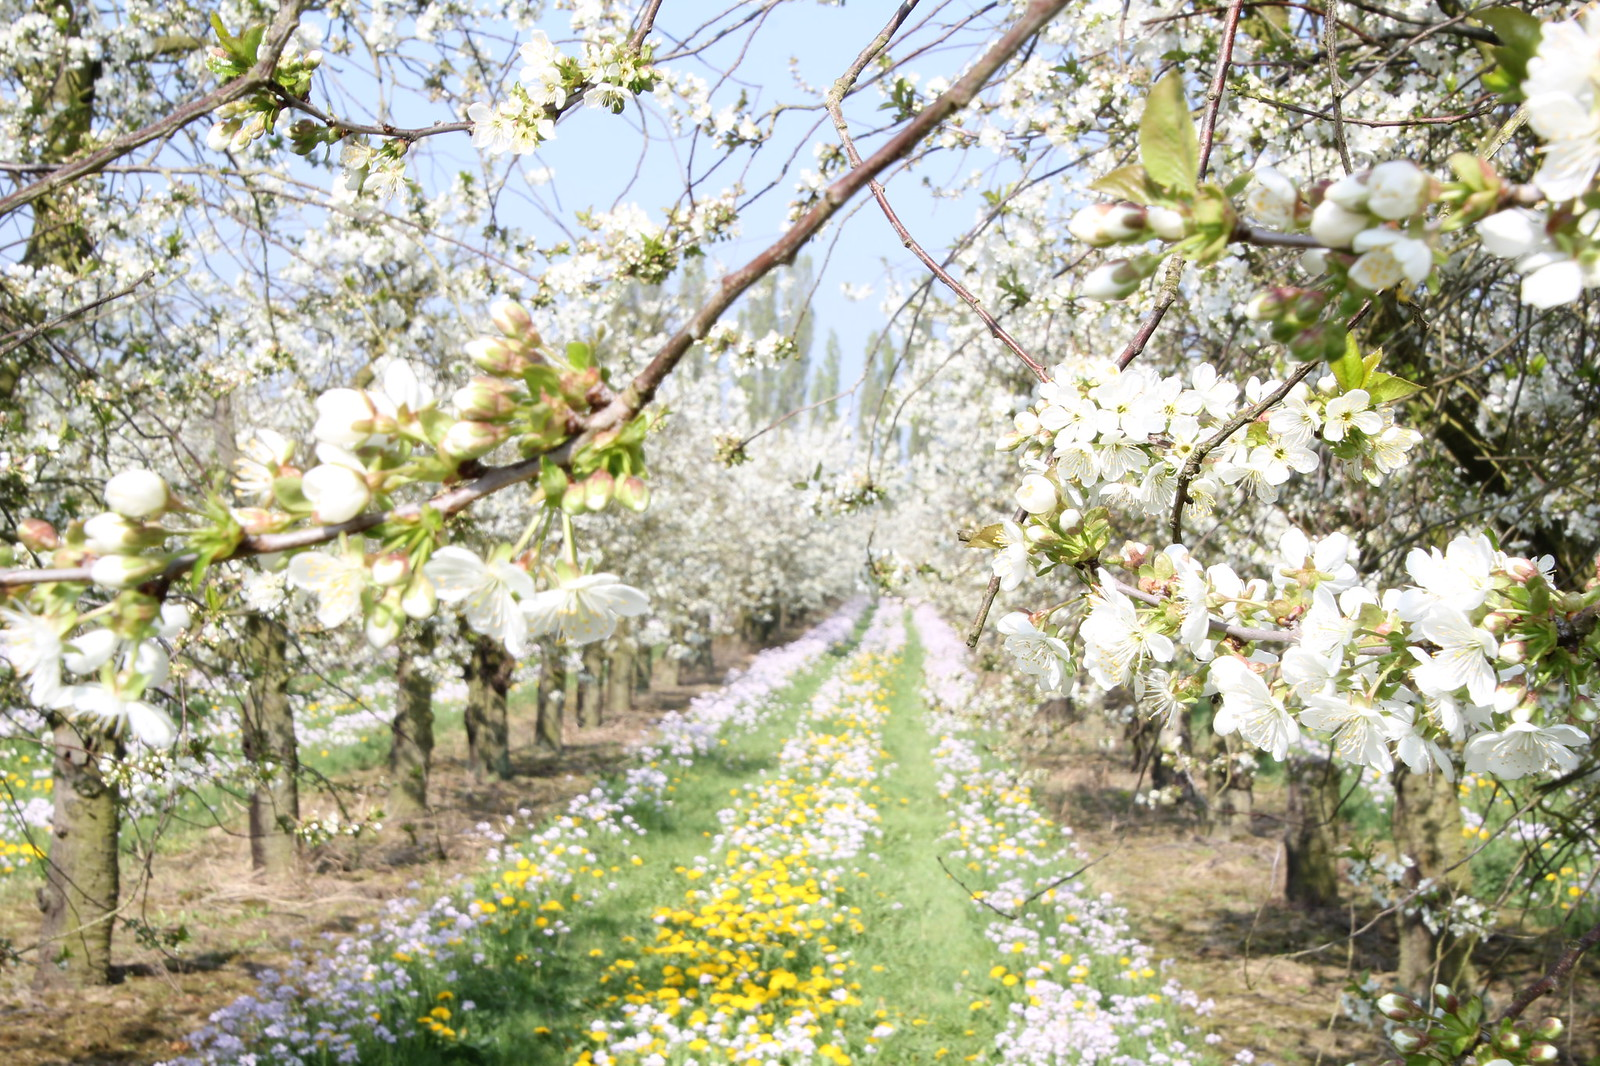 Alltagsfluchten blühende Kirschbäume